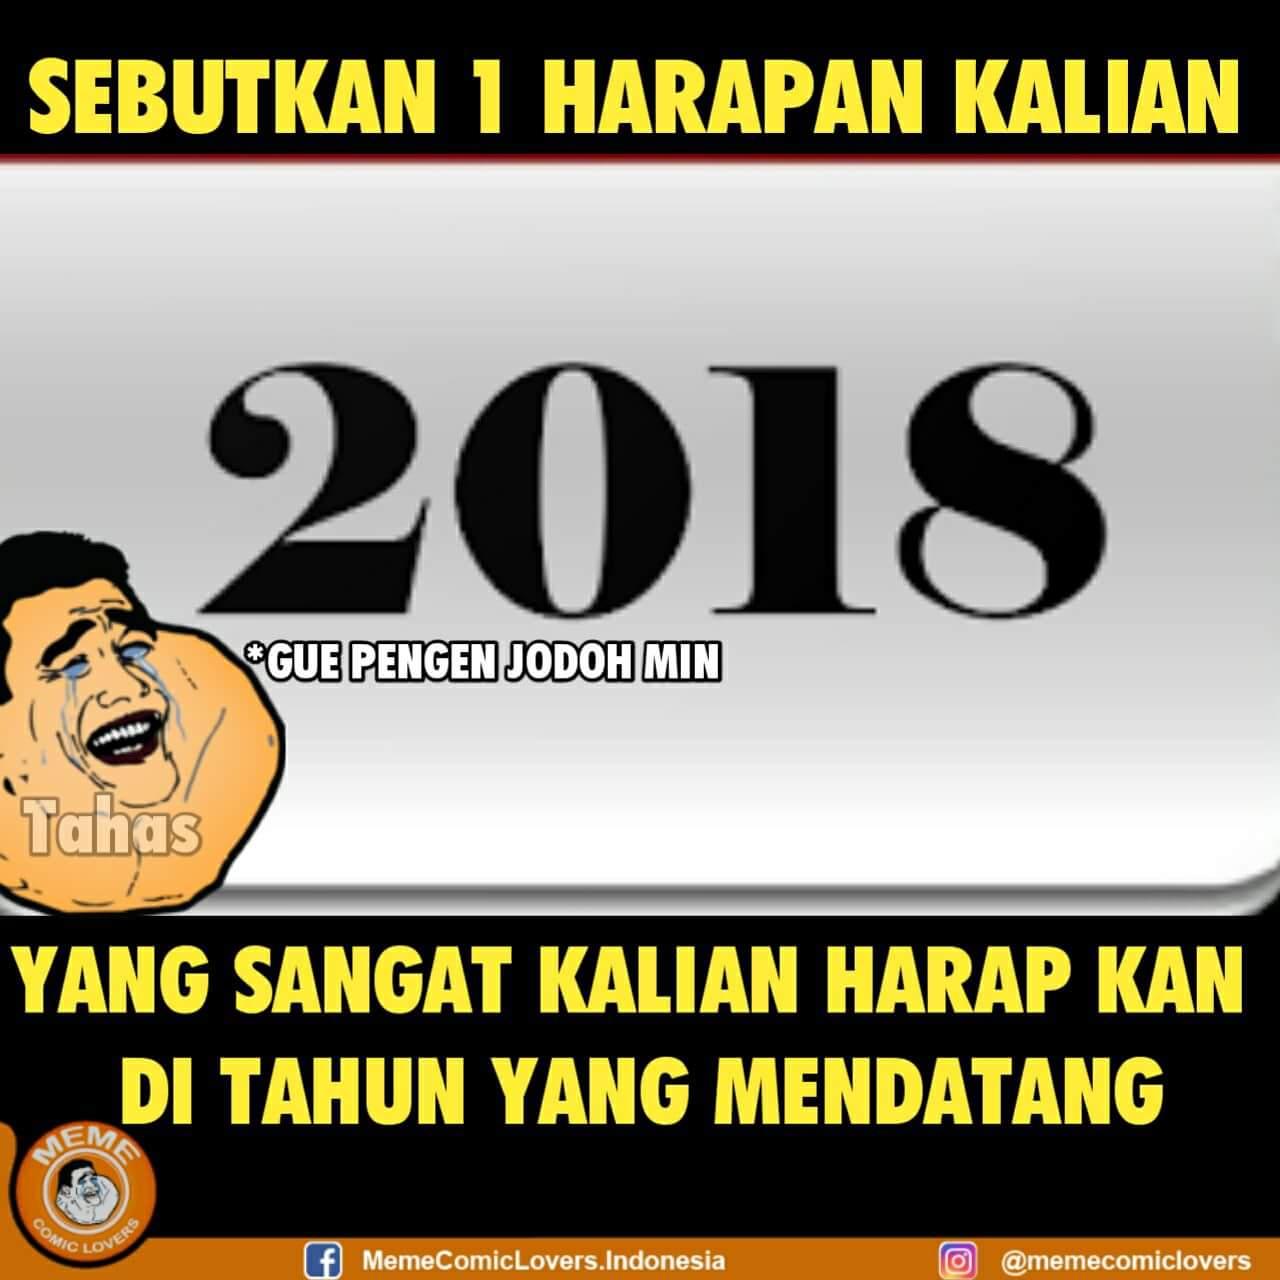 5 meme harapan tahun baru para jomblo di 2018 yang bikin geleng